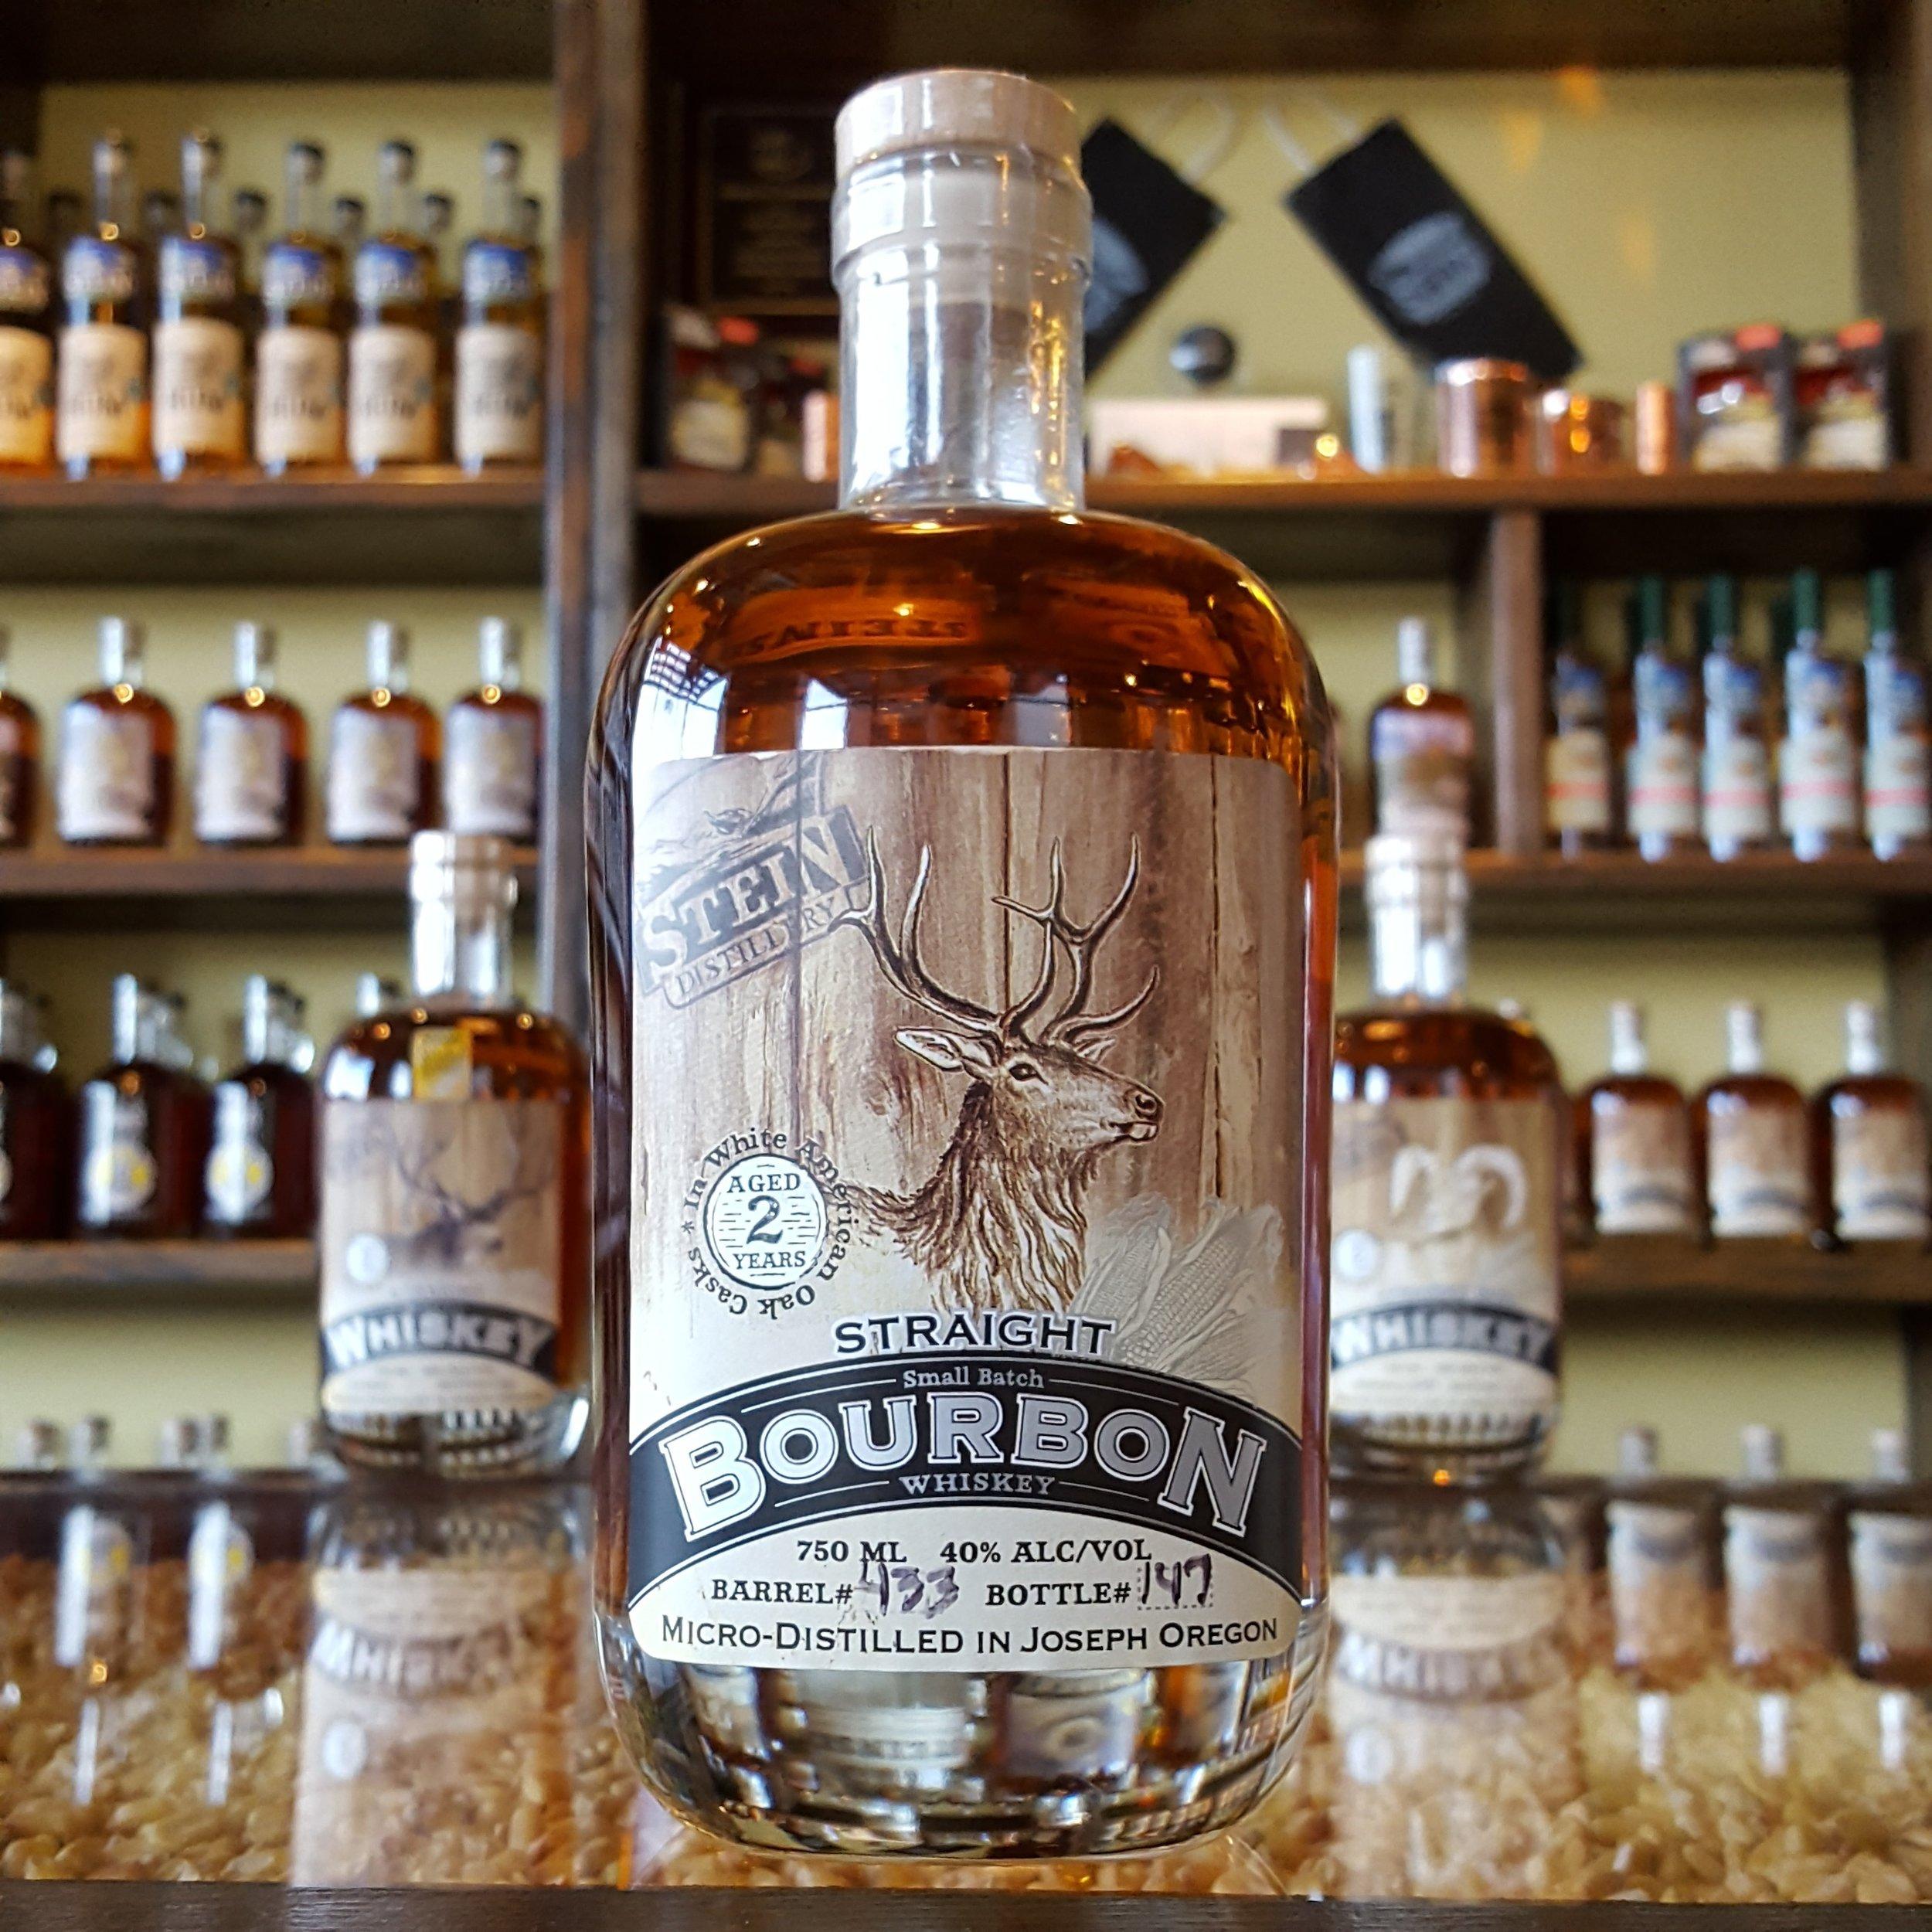 2yr Straight Bull Bourbon - OLCC Code: 0580B